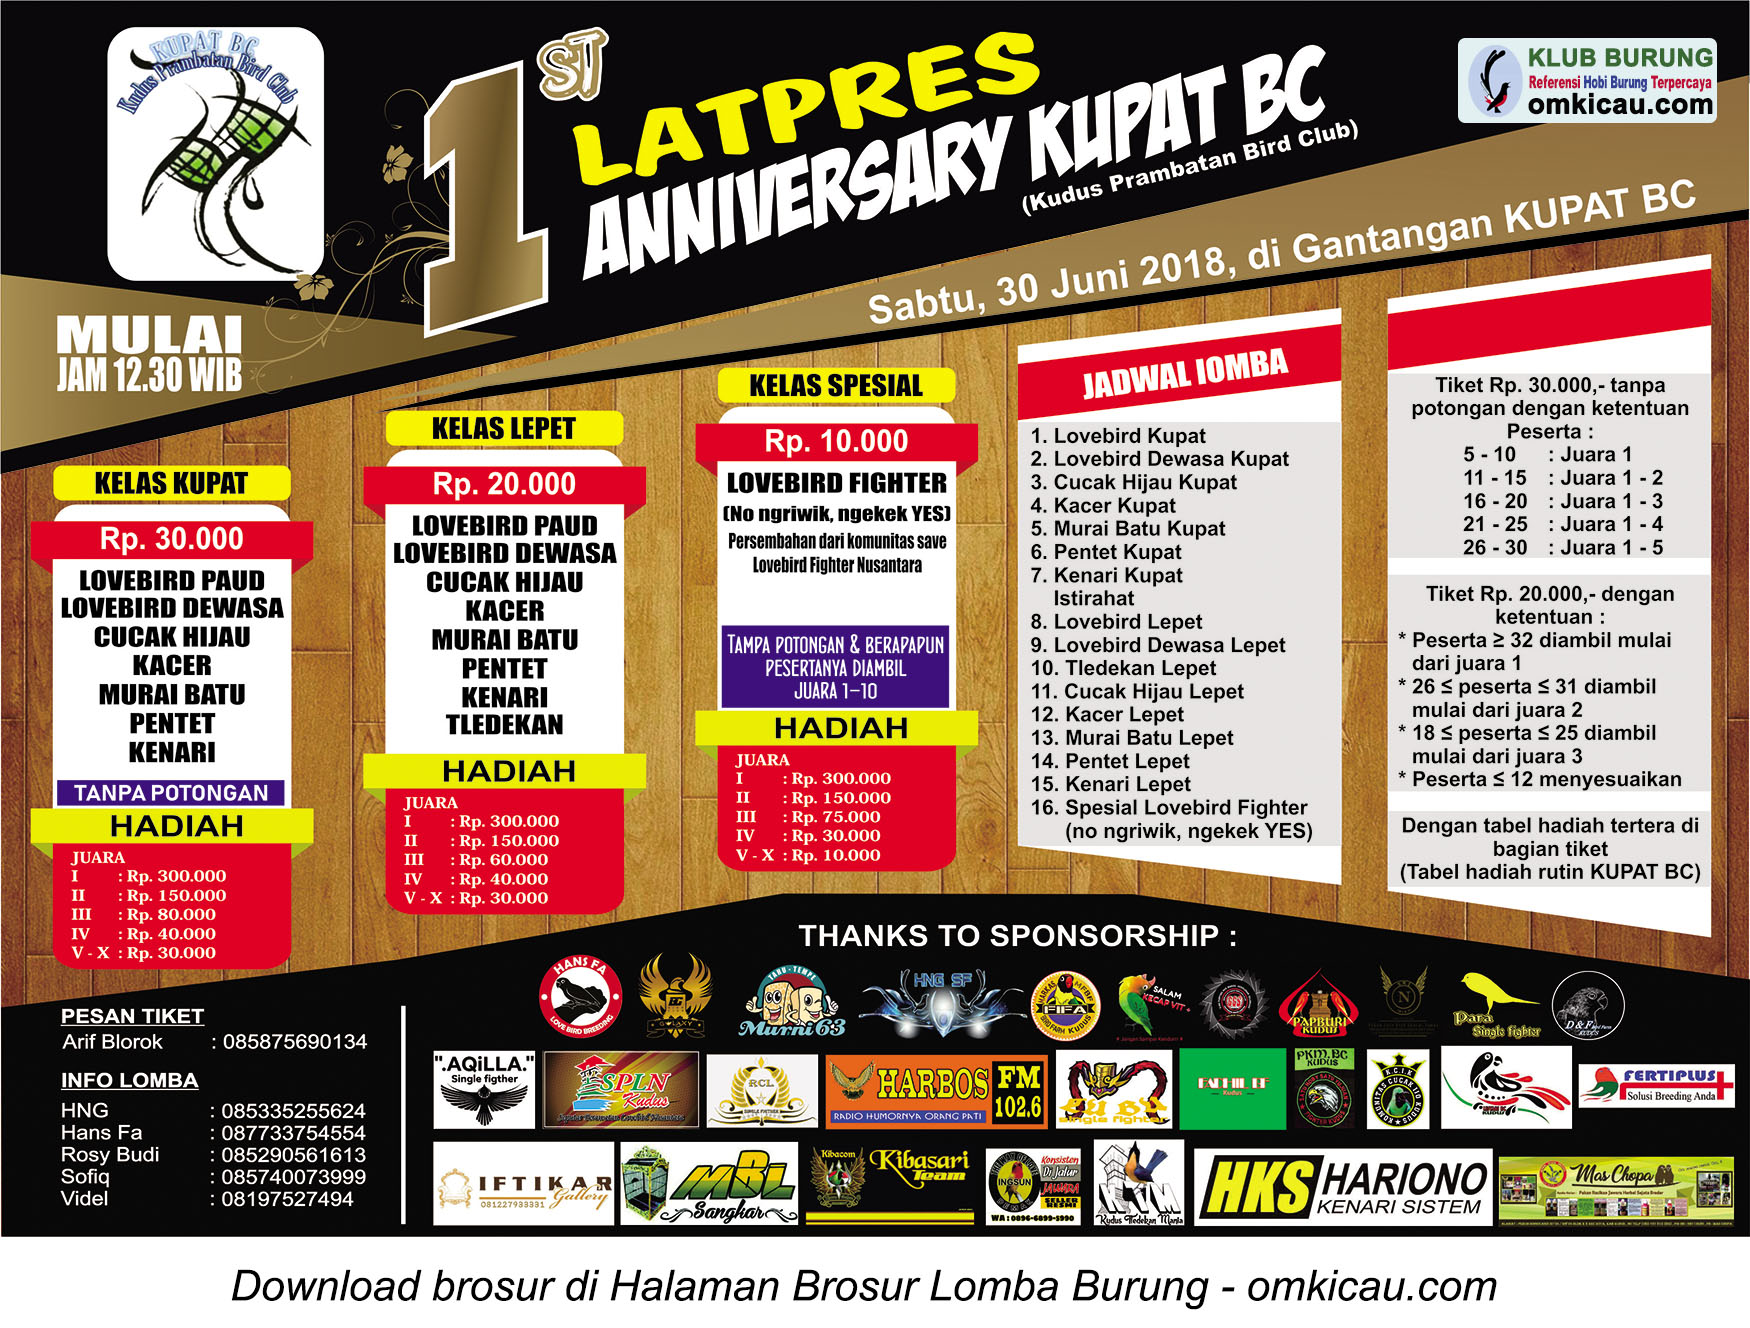 Latpres 1st Anniversary Kupat BC